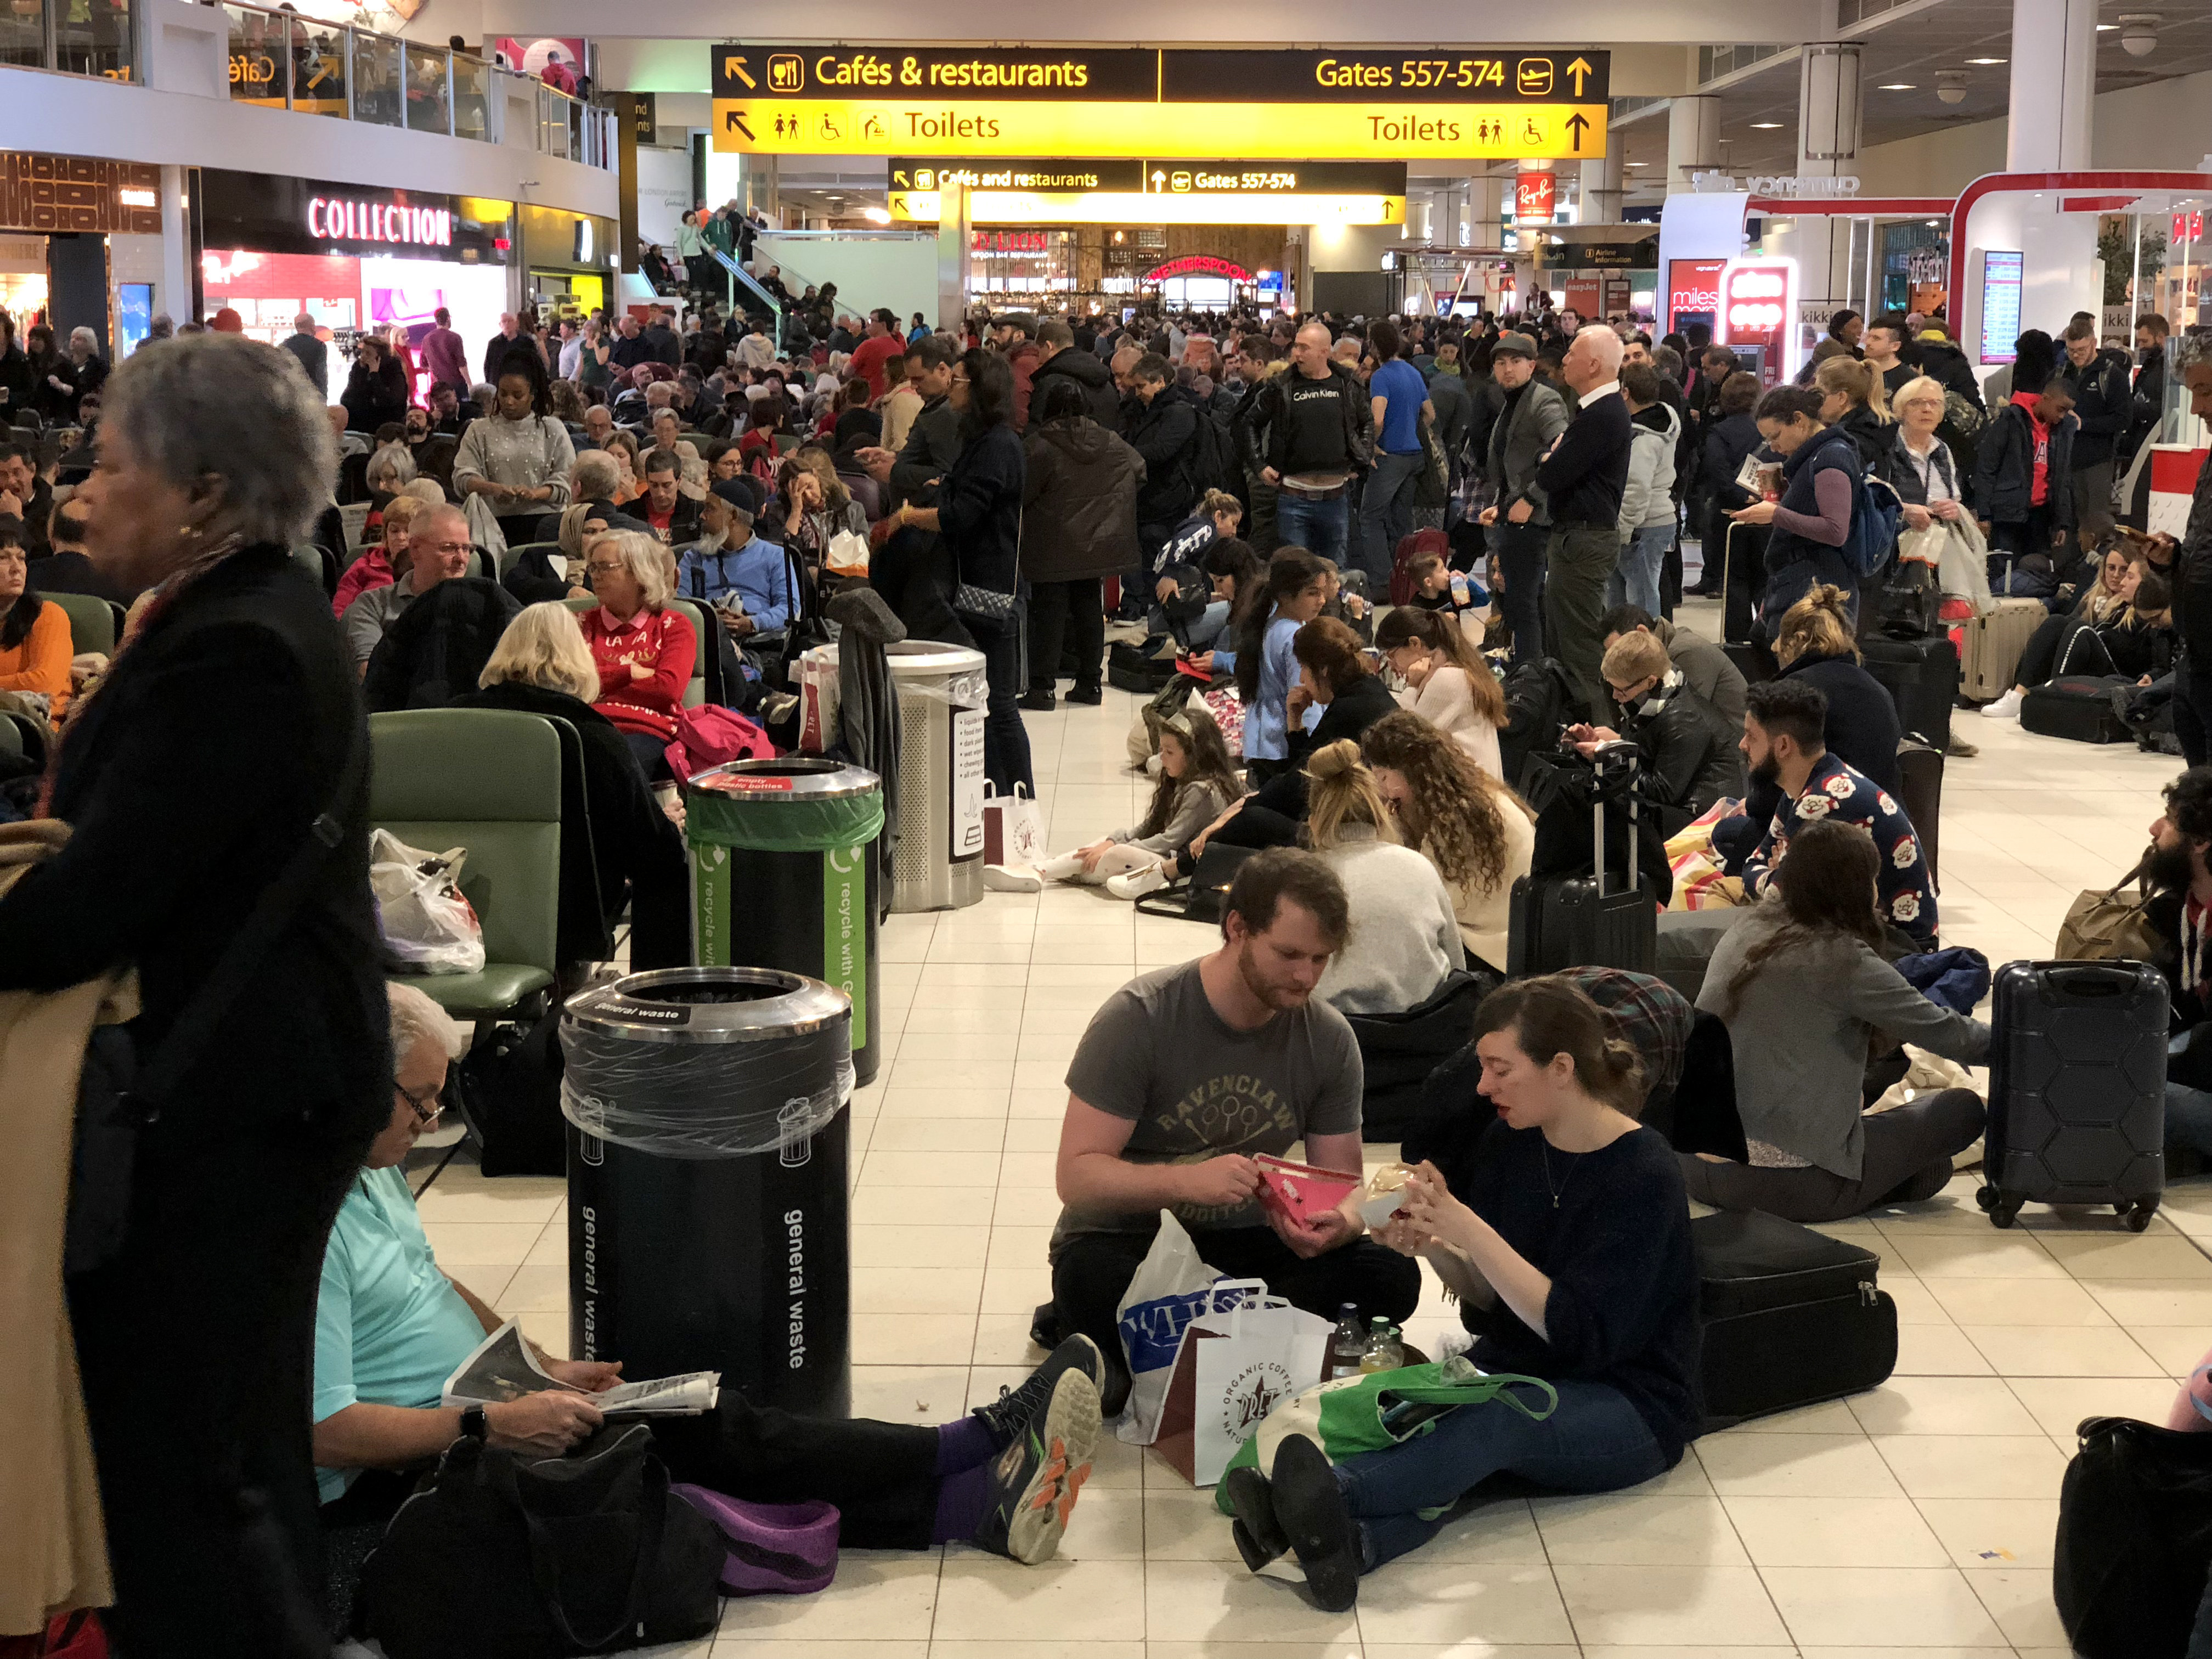 Drones Shut Down Britain's Second-Biggest Airport During Peak Holiday Travel Season